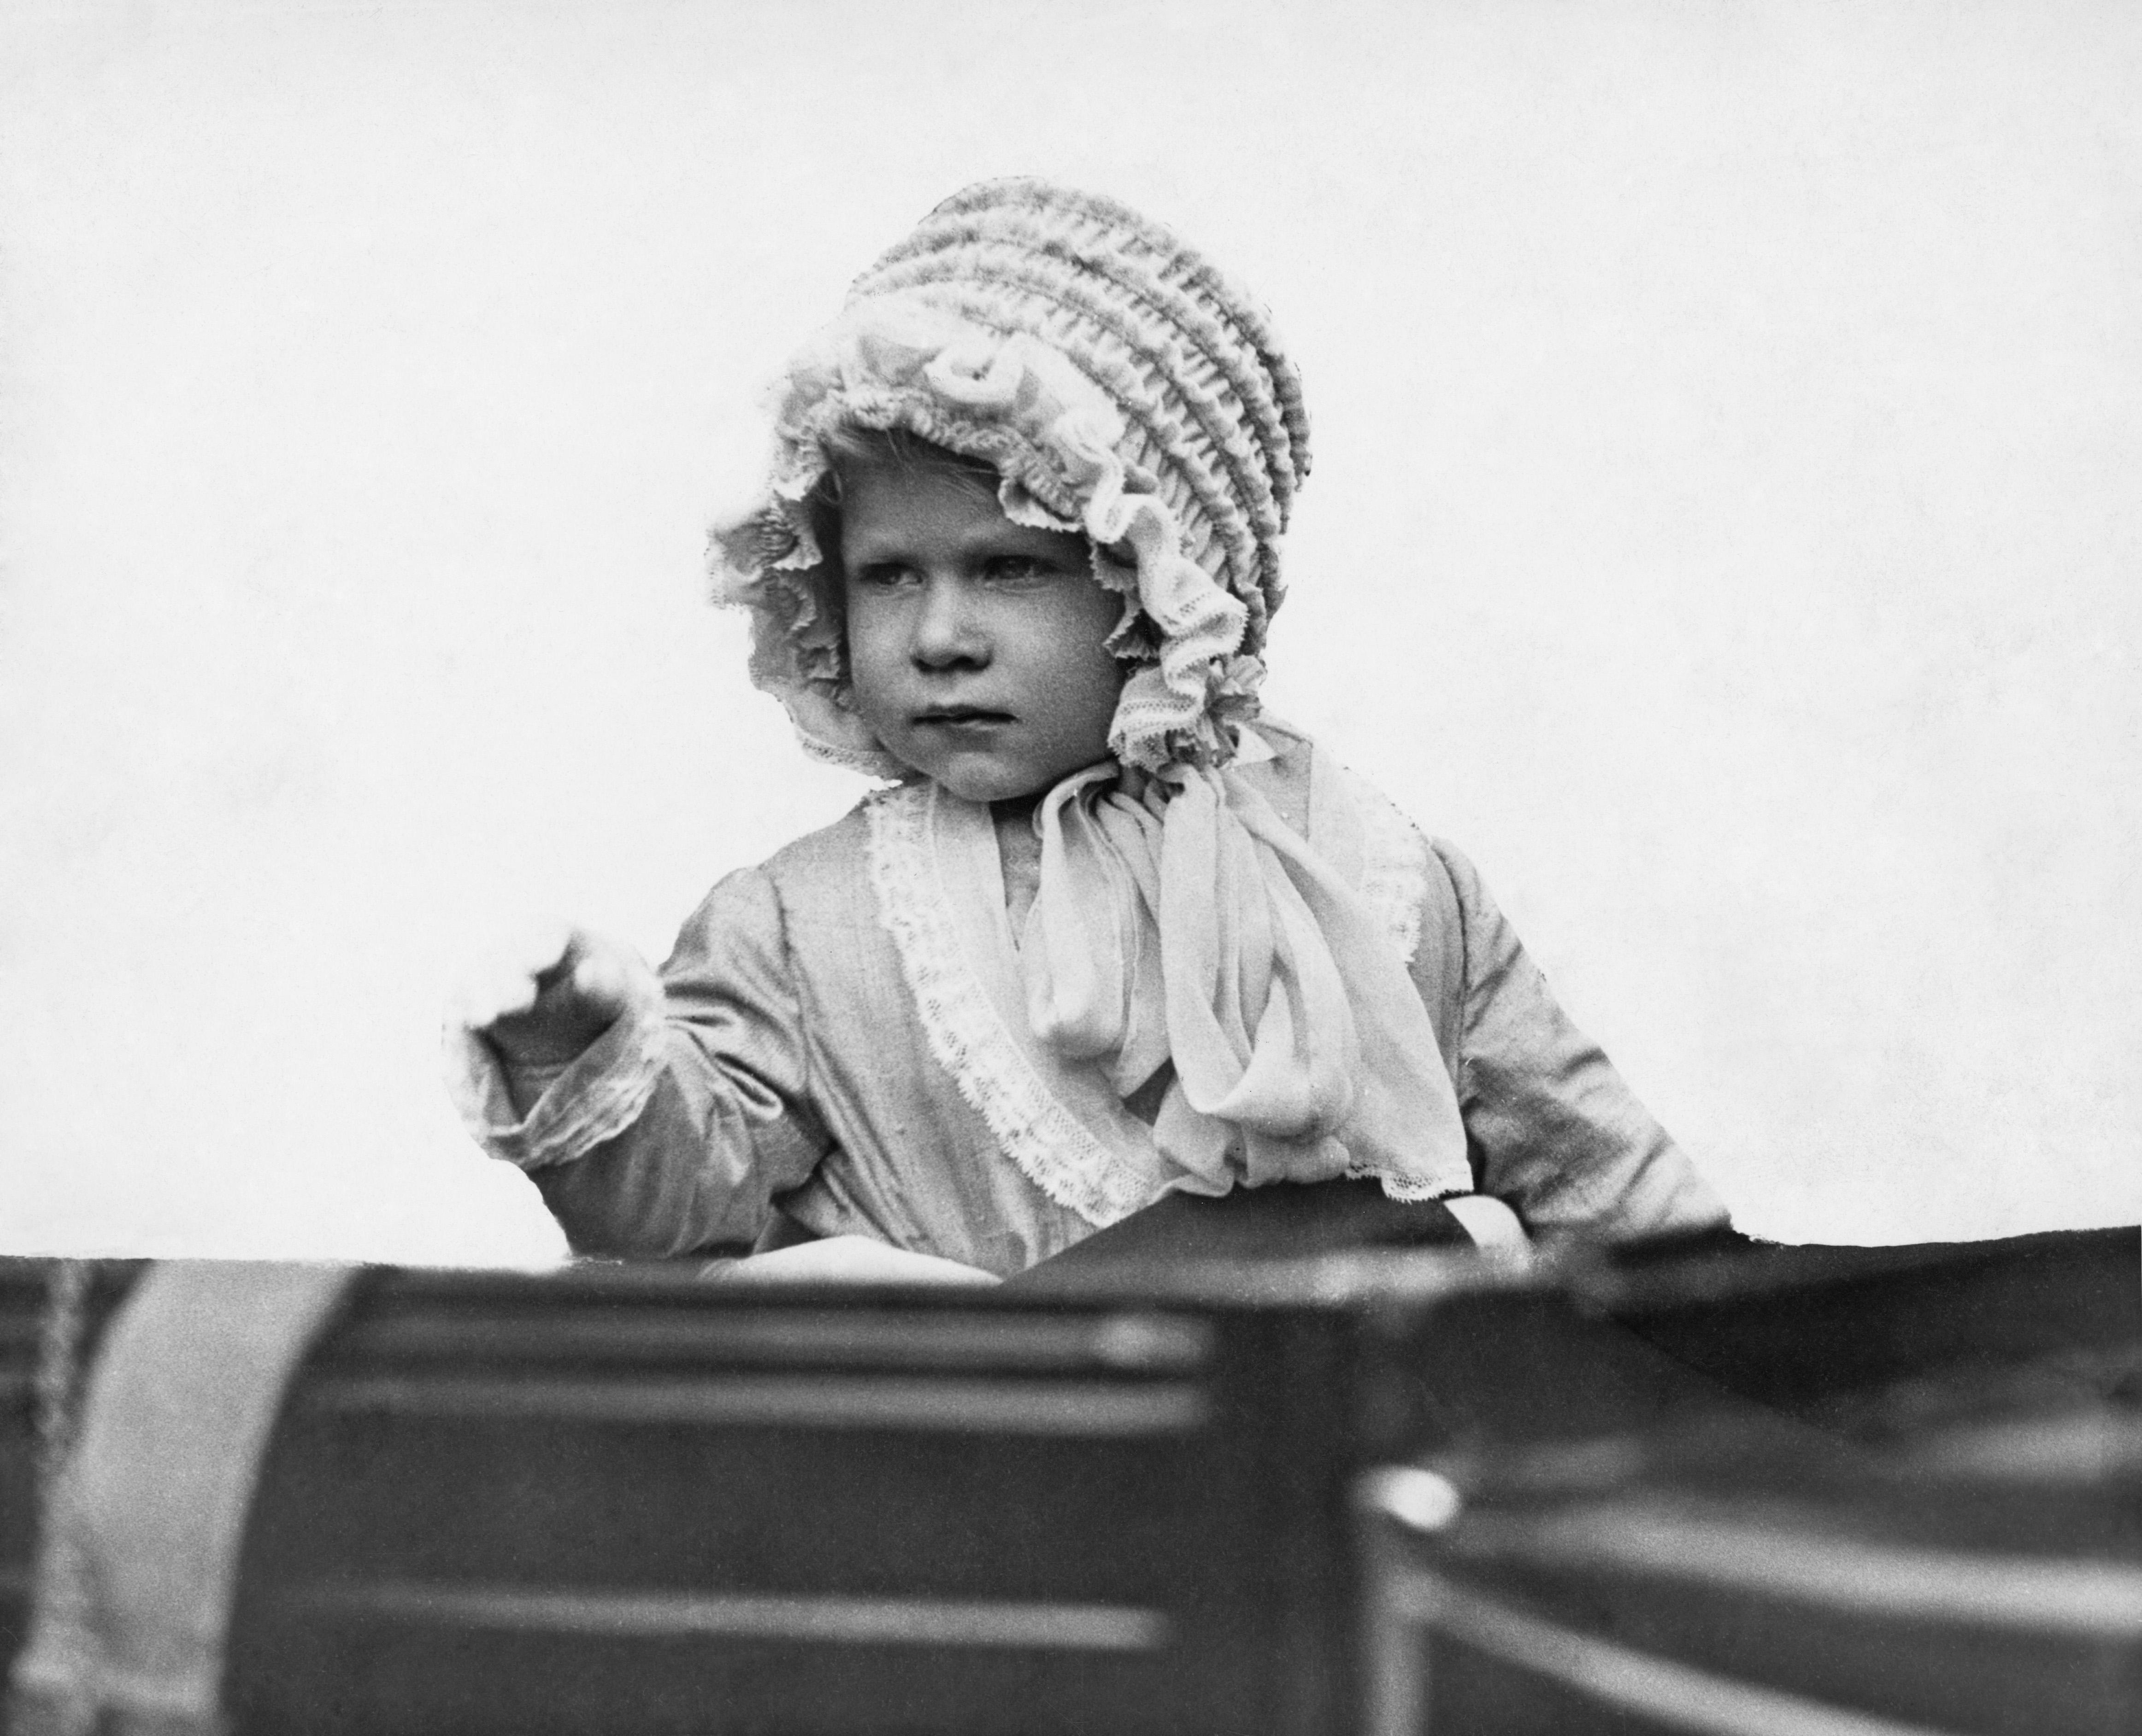 Princess Elizabeth Age 2 Getty Images